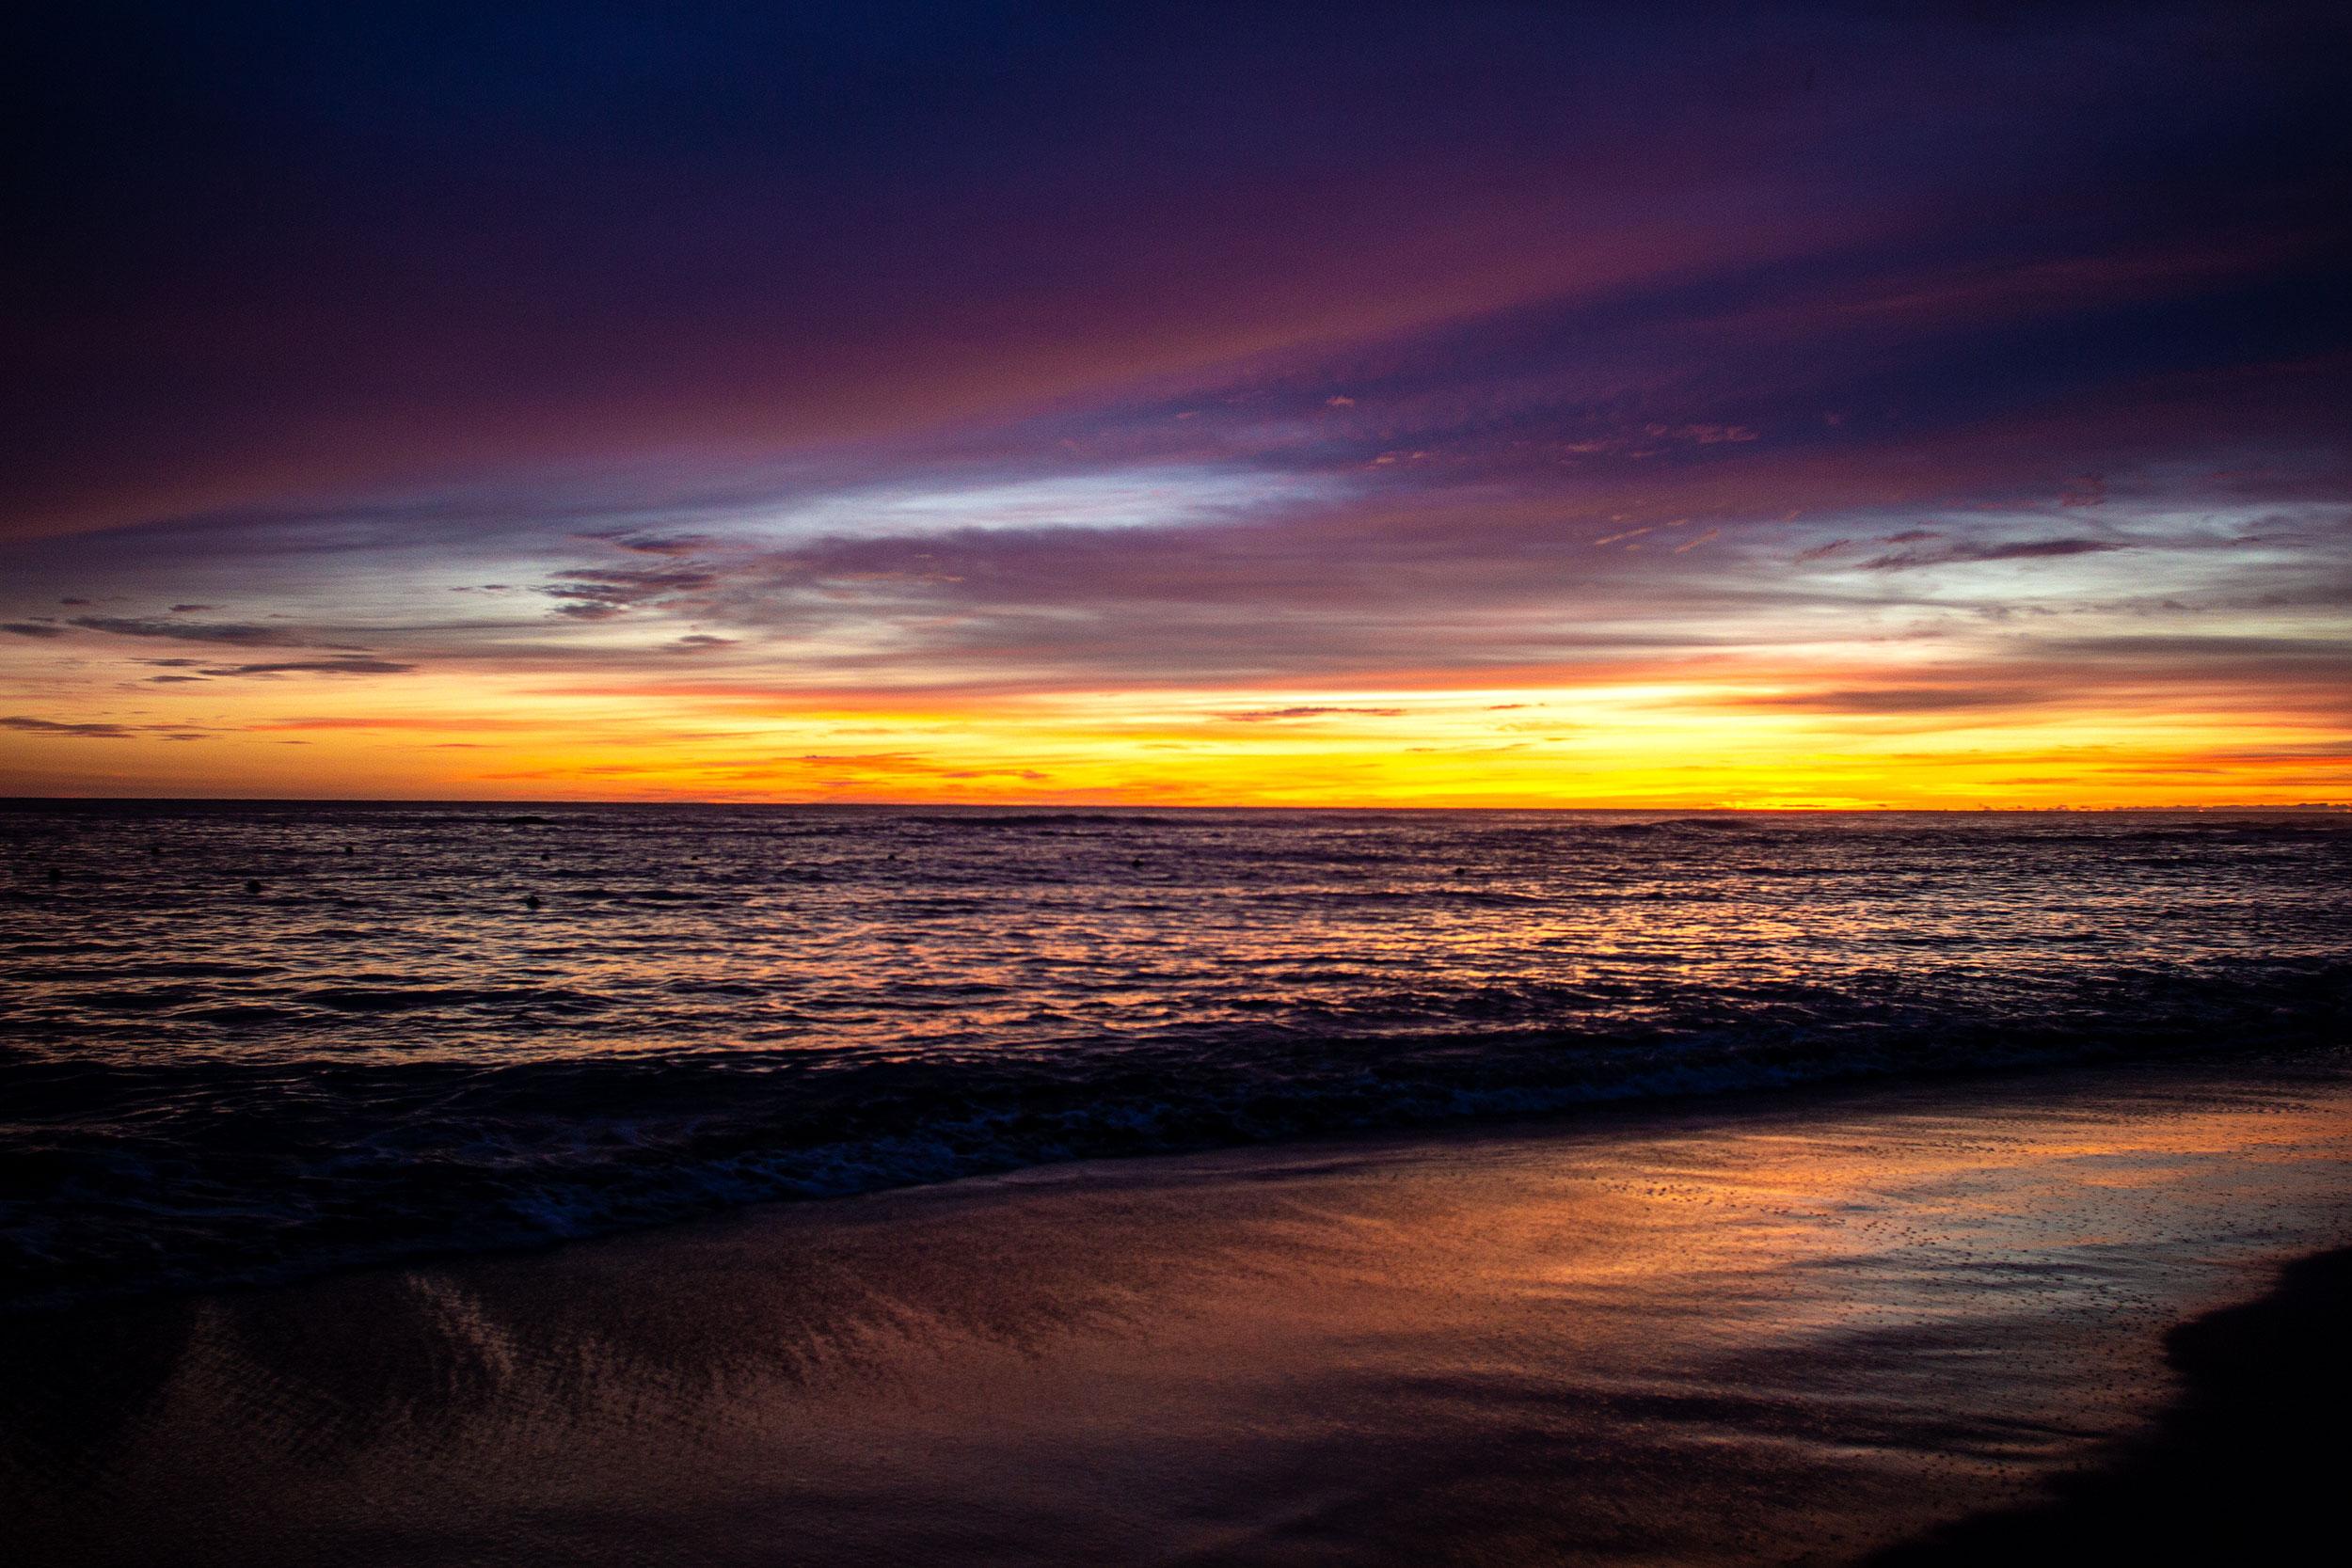 Playa-Avellana-Sunset4.jpg